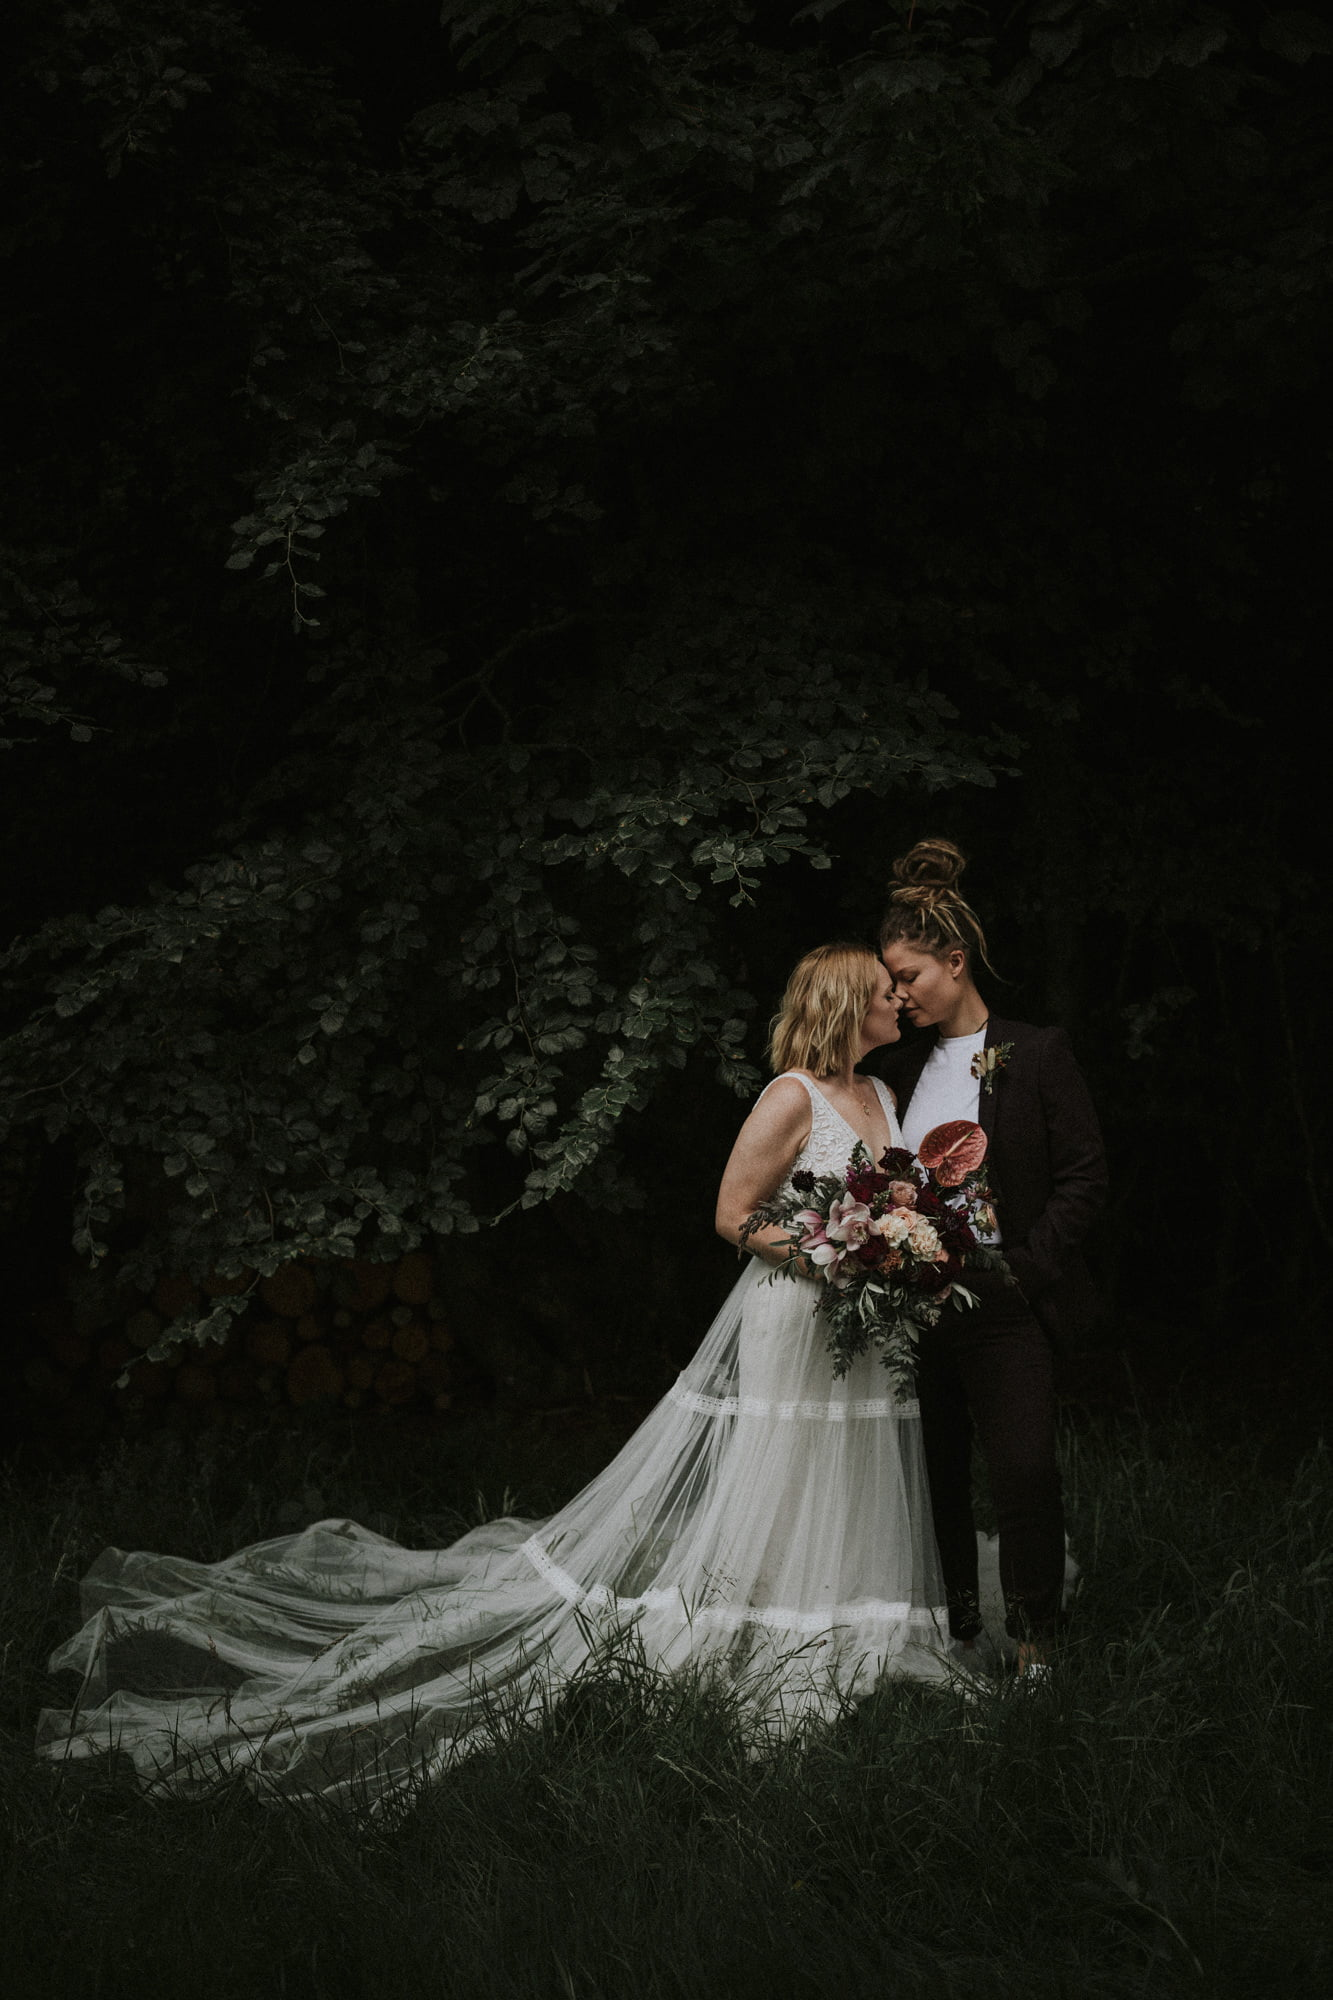 Scotland same-sex elopement, Glen Dye Cabins & Cottages elopement, Bridge of Dye elopement, Ella Mai Elopements Planner Scotland